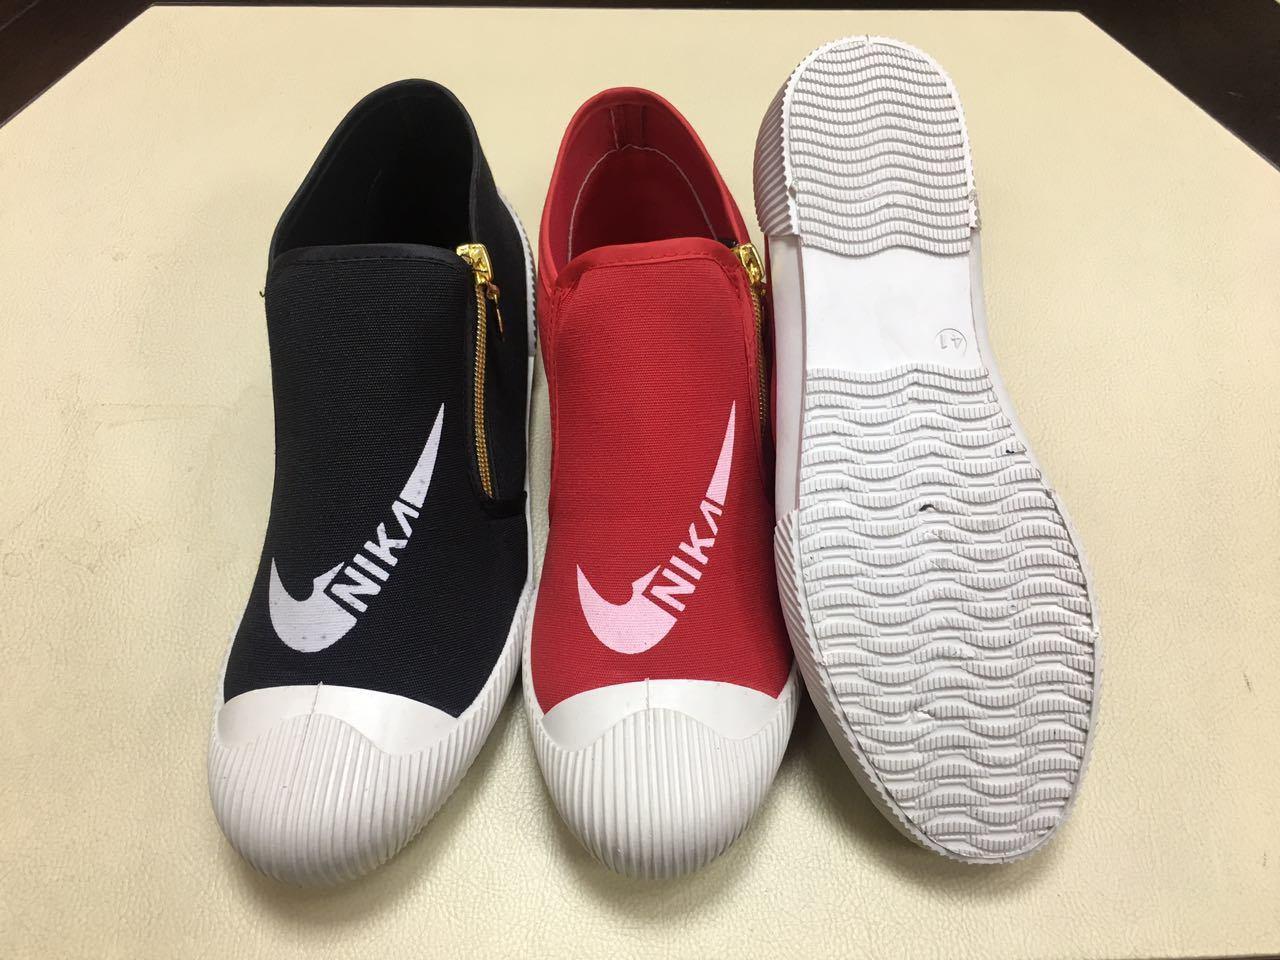 Vulcanized Shoes PVC out Sole Casual Canvas Kids Shoes